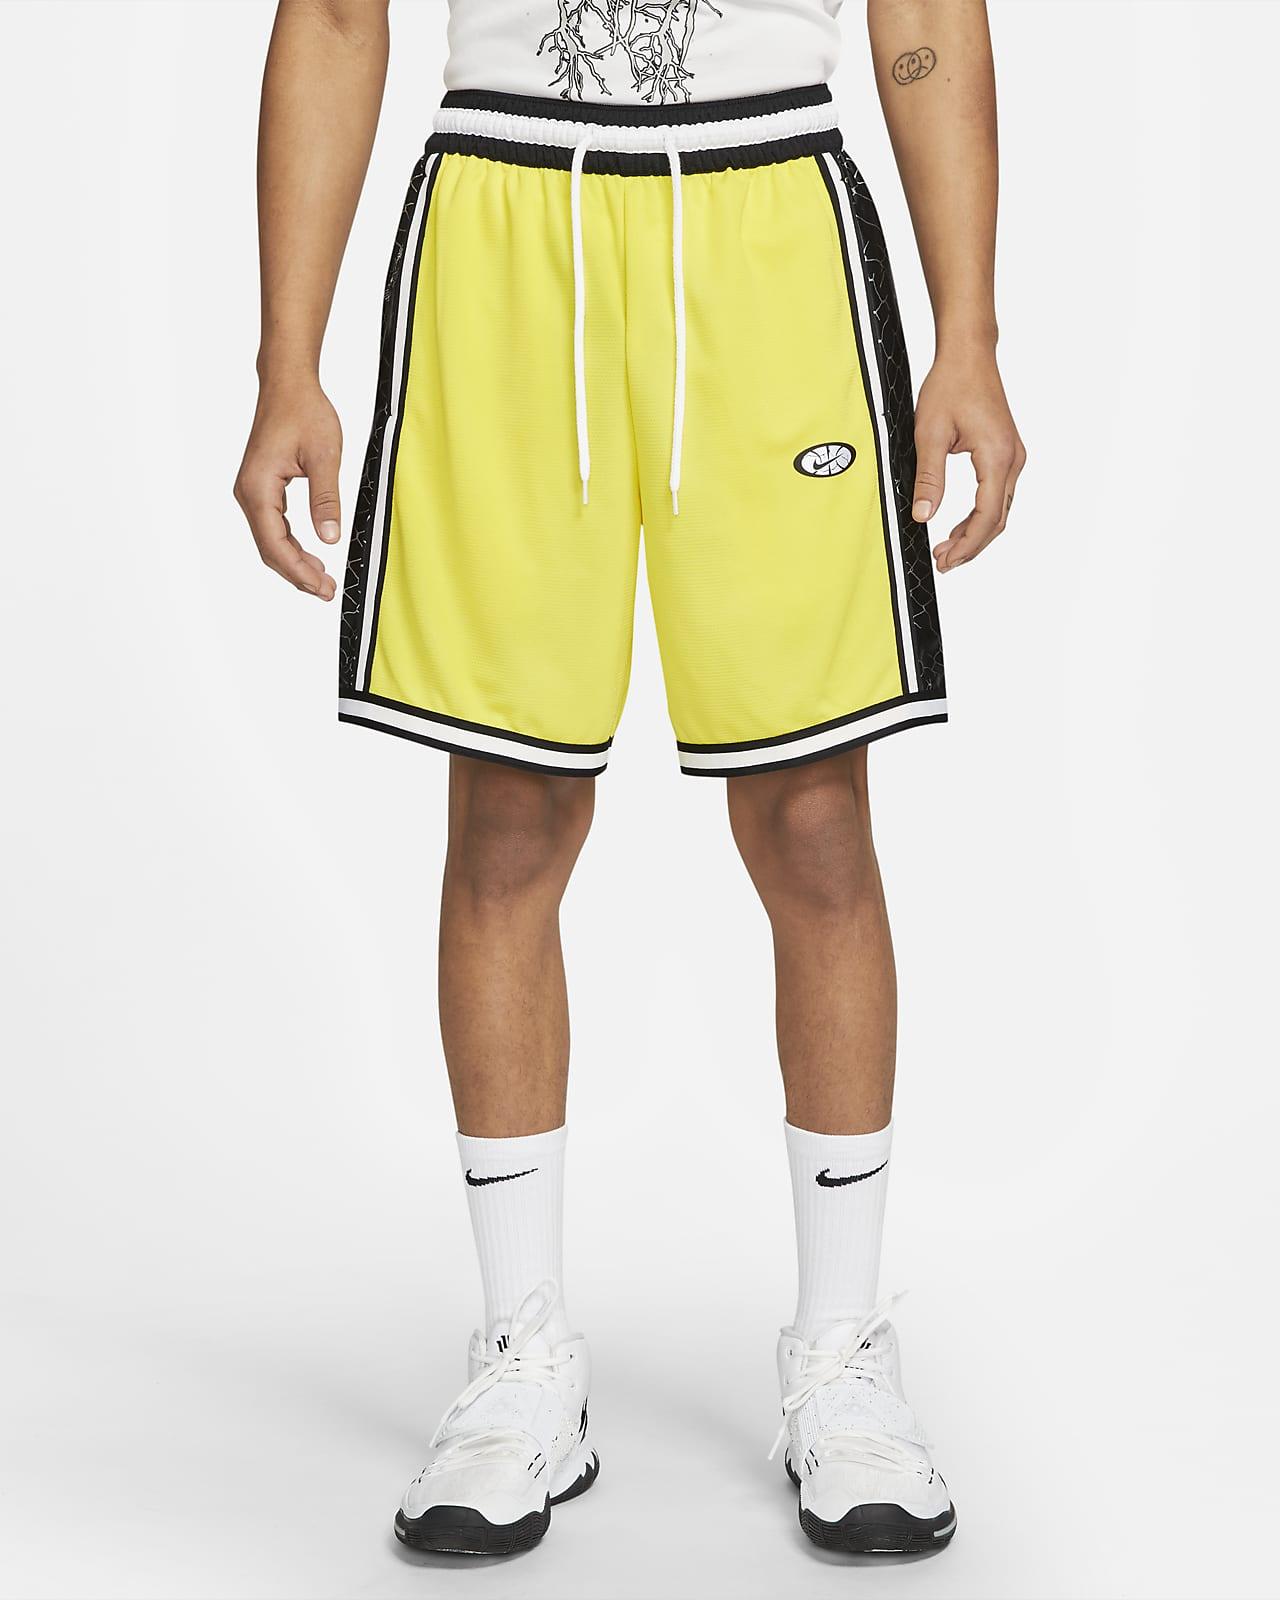 Nike Dri-FIT DNA+ Men's Basketball Shorts